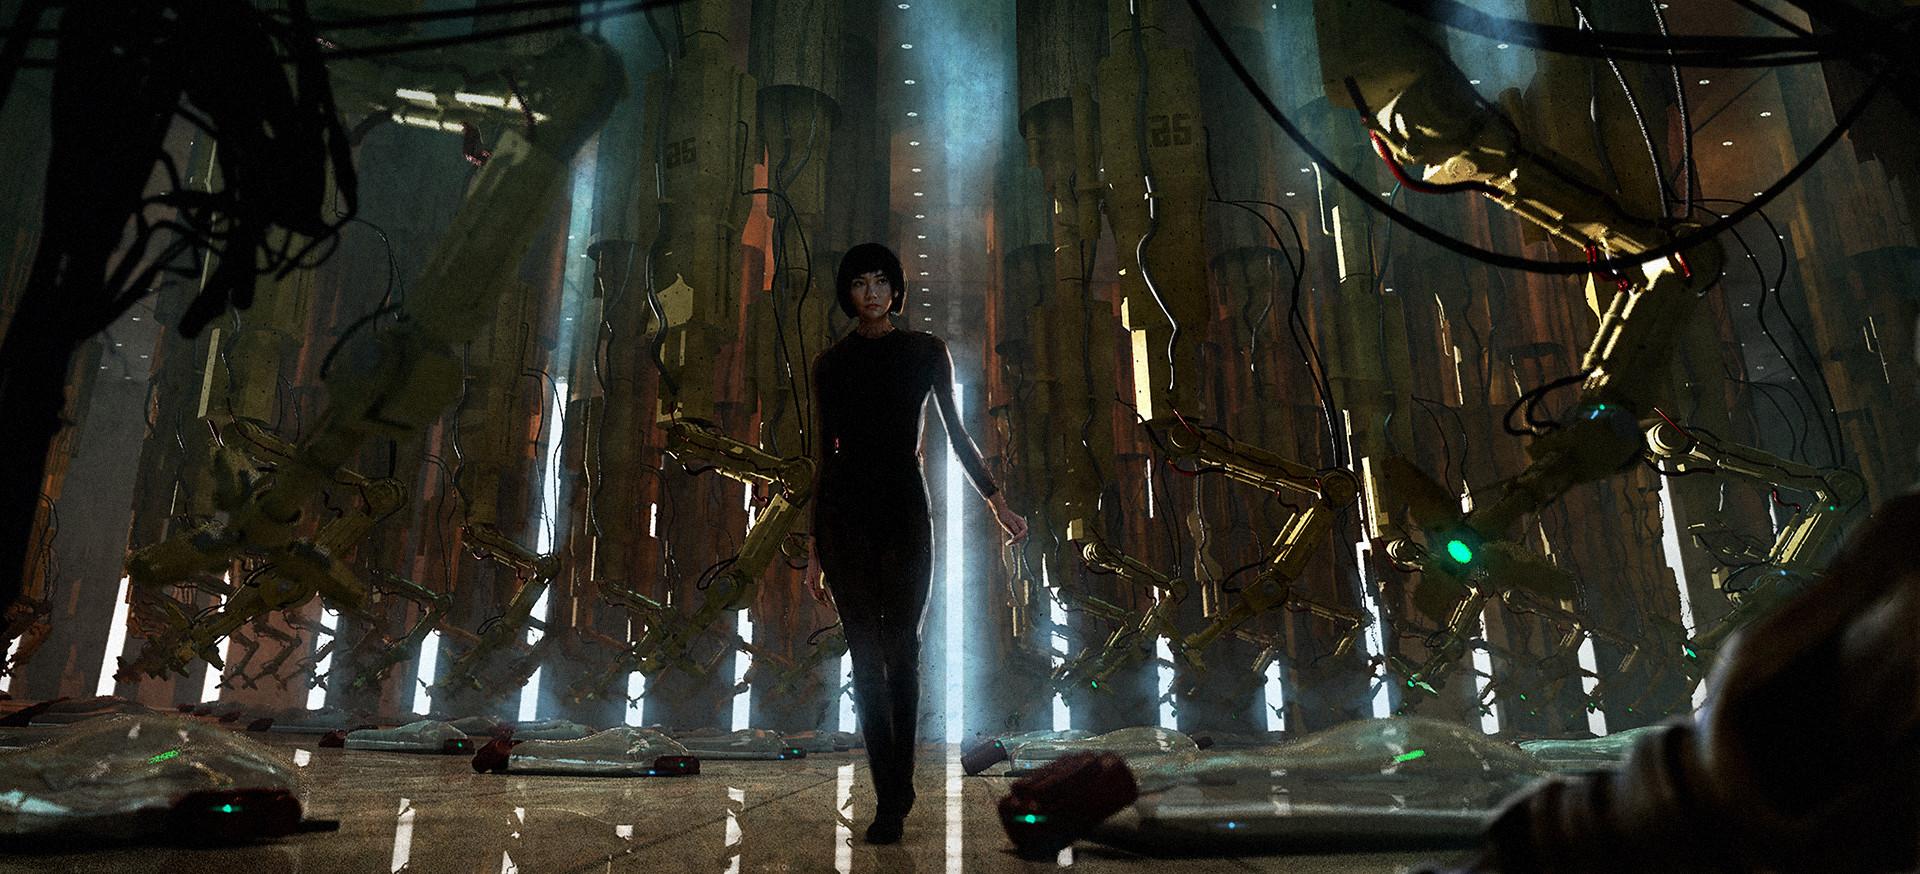 The Sci-Fi & Movie Art of Greg Jonkajtys